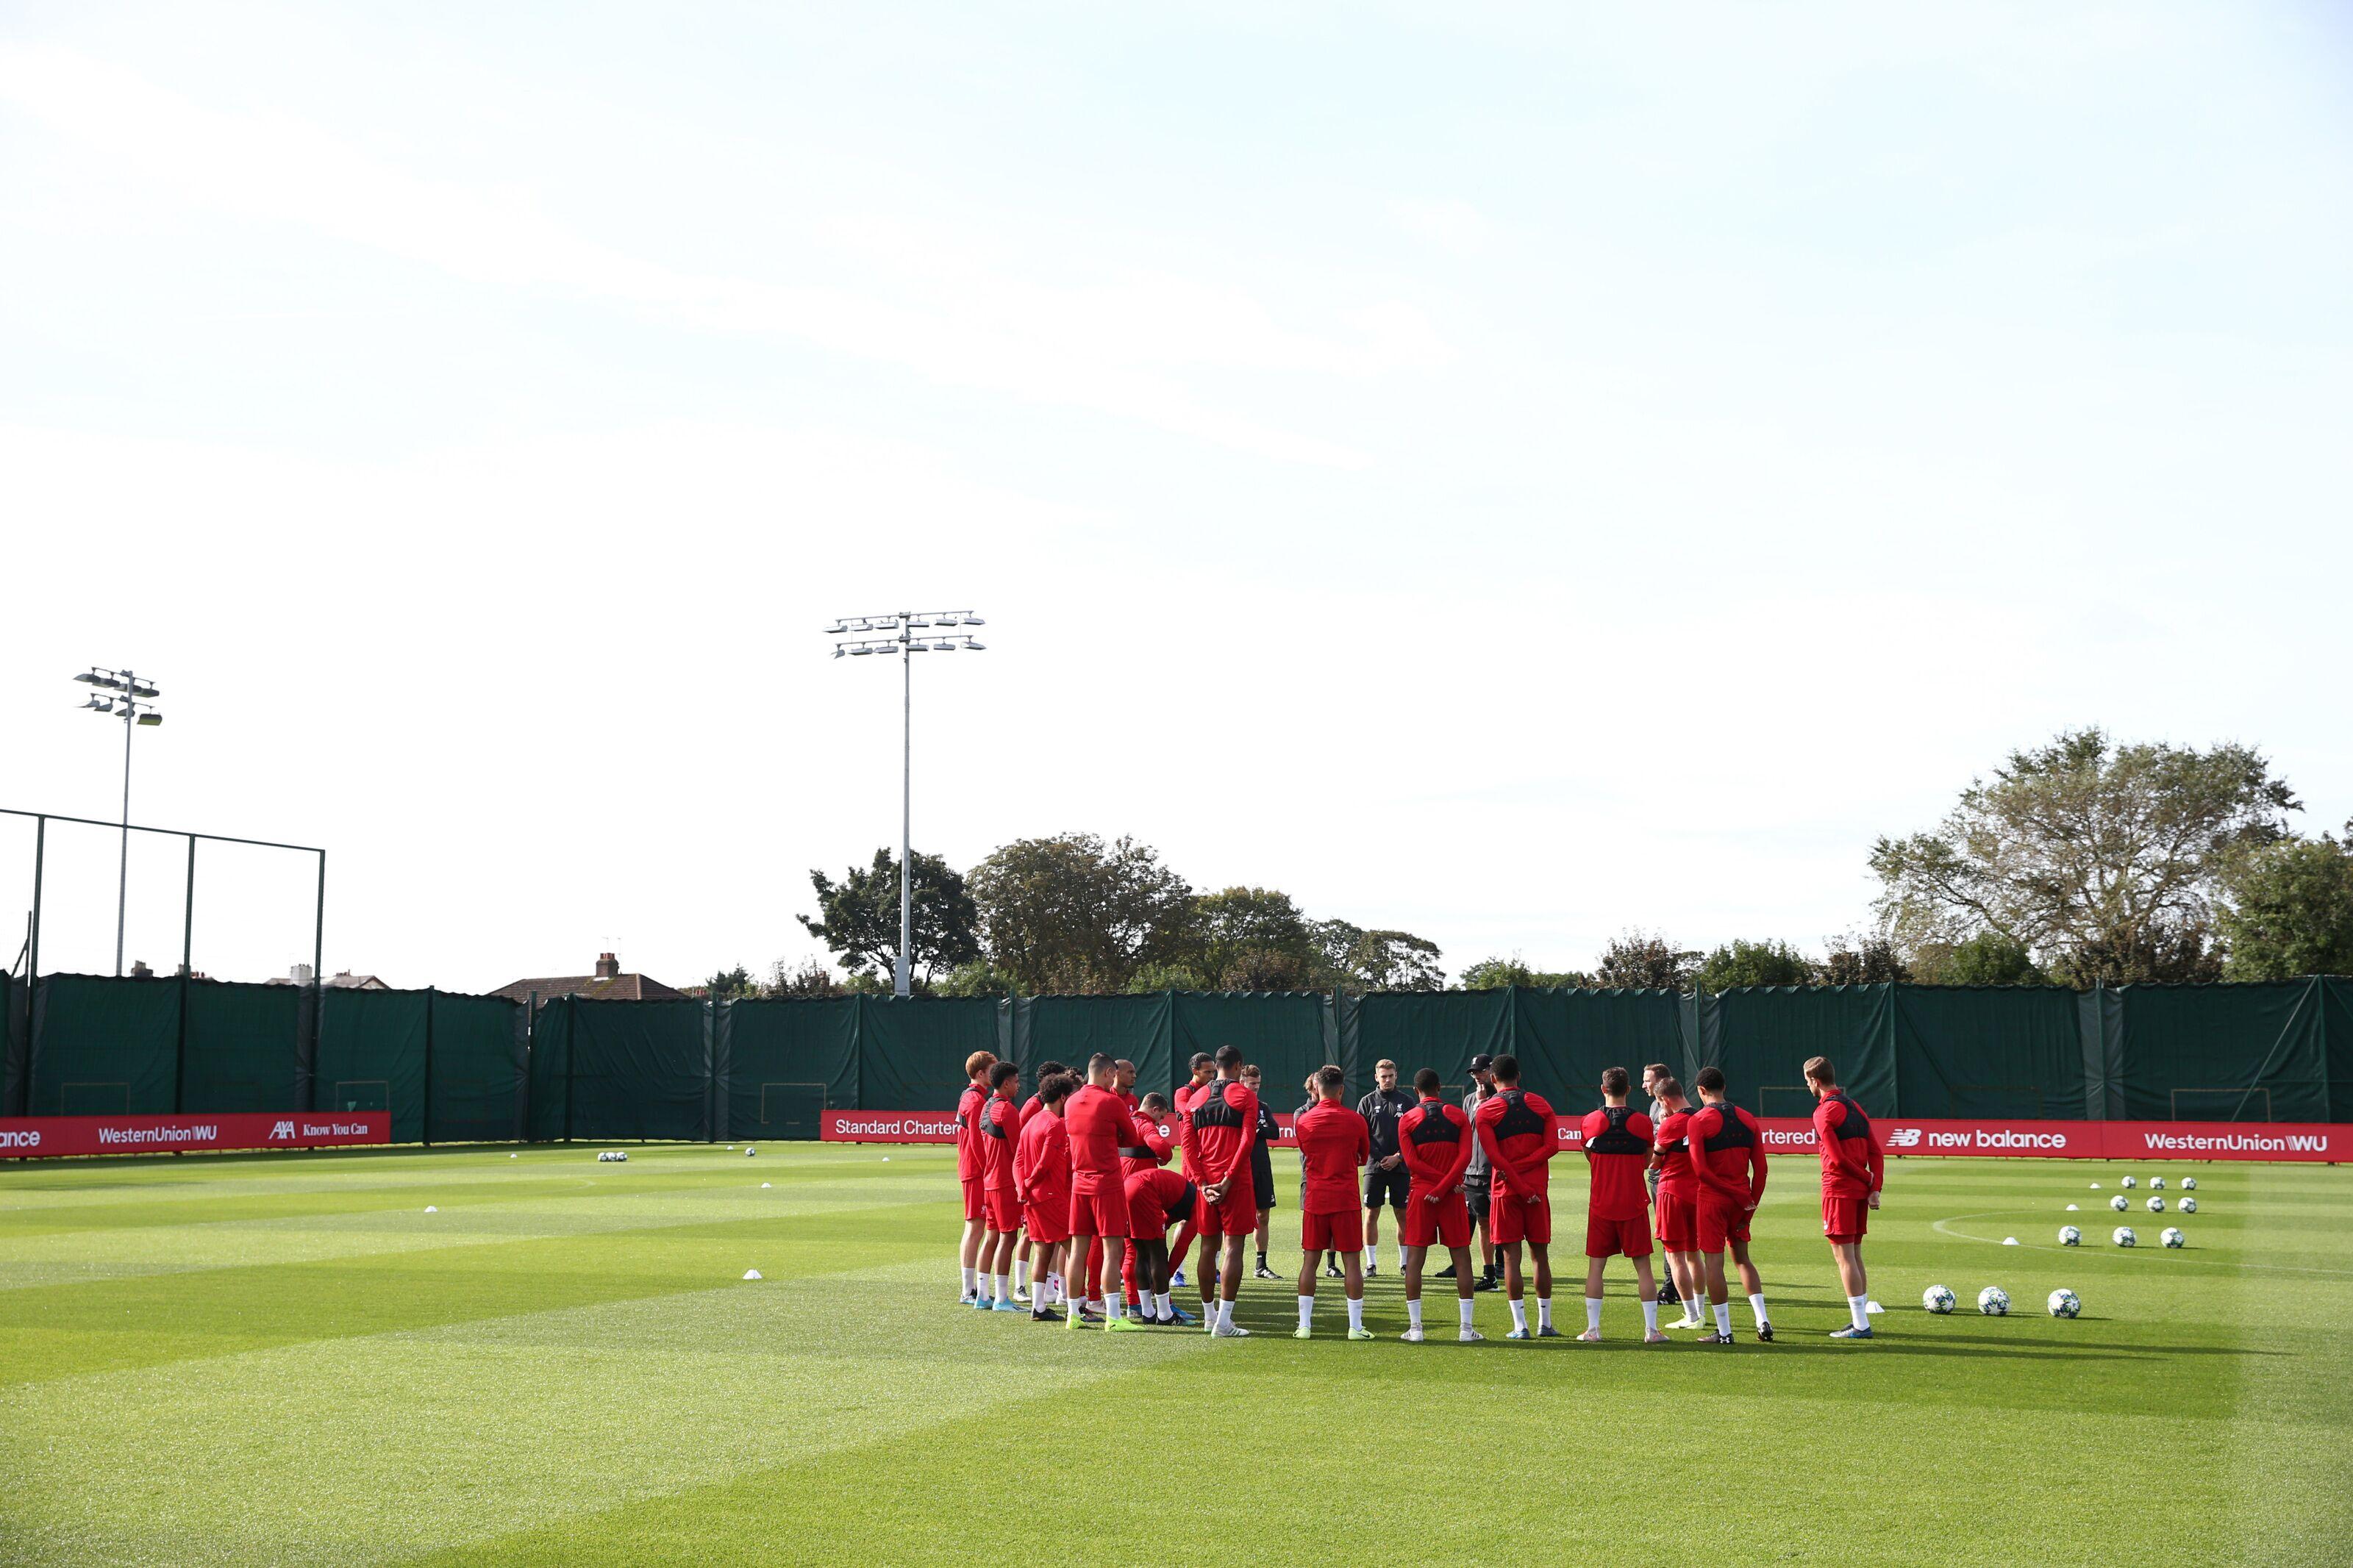 Liverpool vs Man Utd: Maximum disrespect? Training drill has Twitter cussing